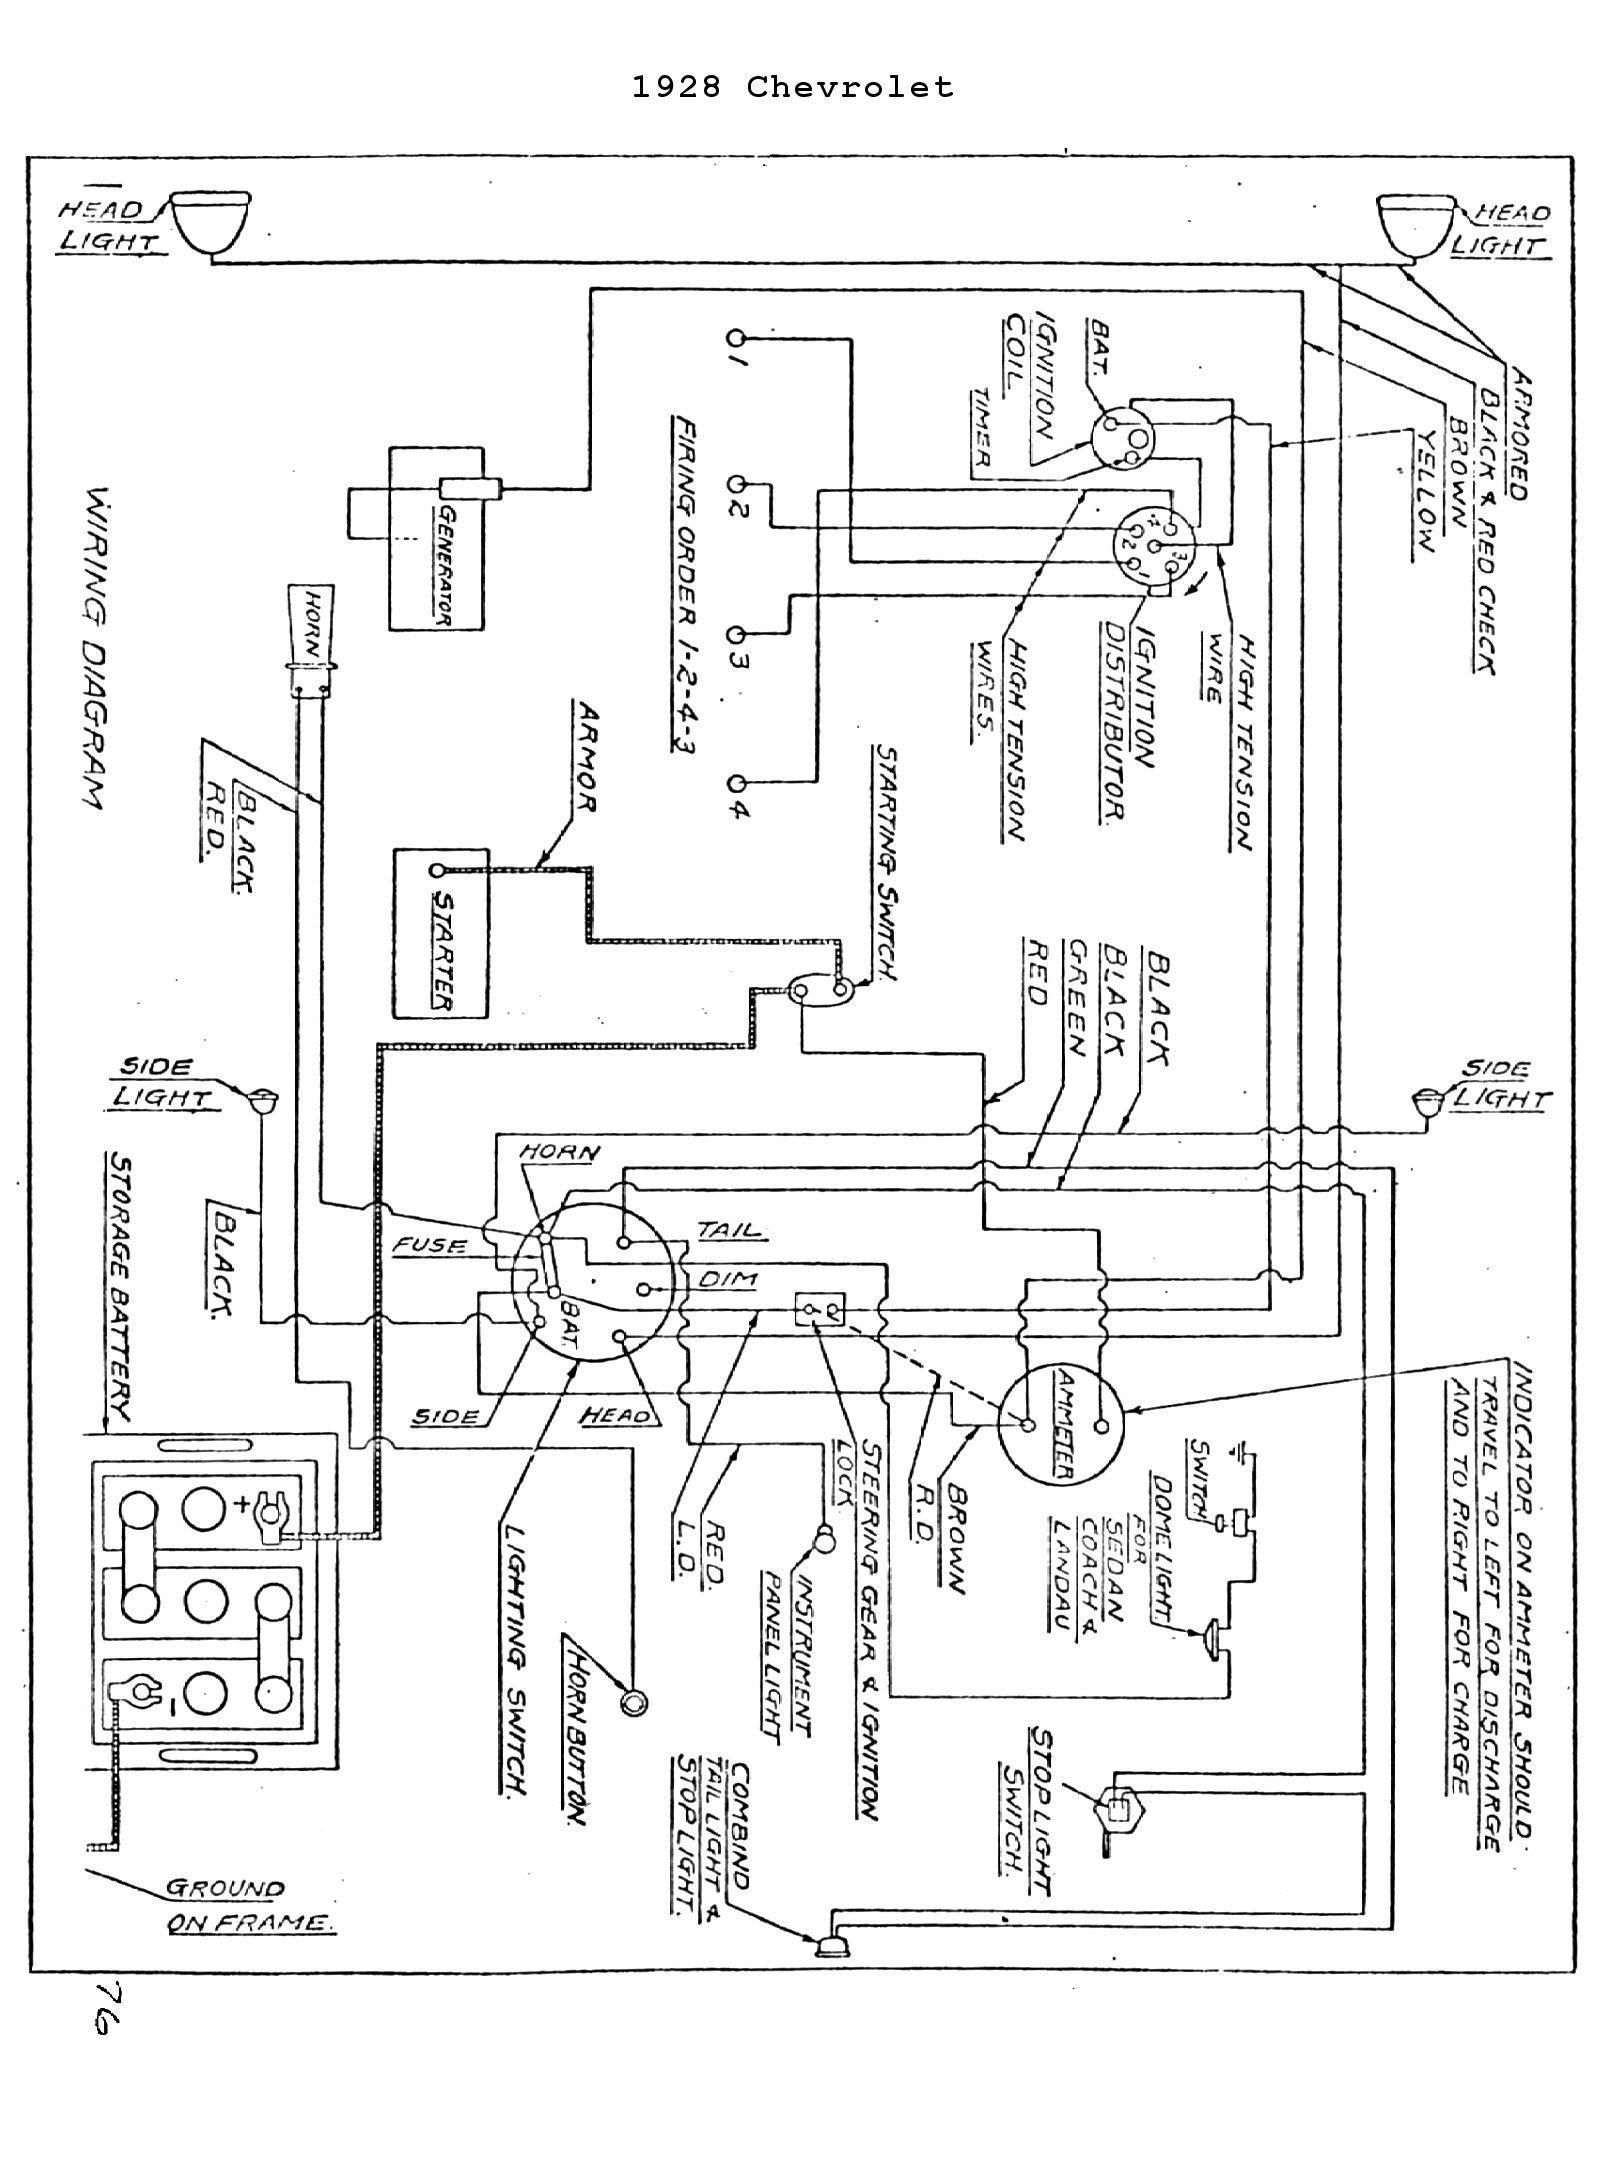 hight resolution of 1928 1928 wiring diagrams 1928 general wiring 1928 wiring